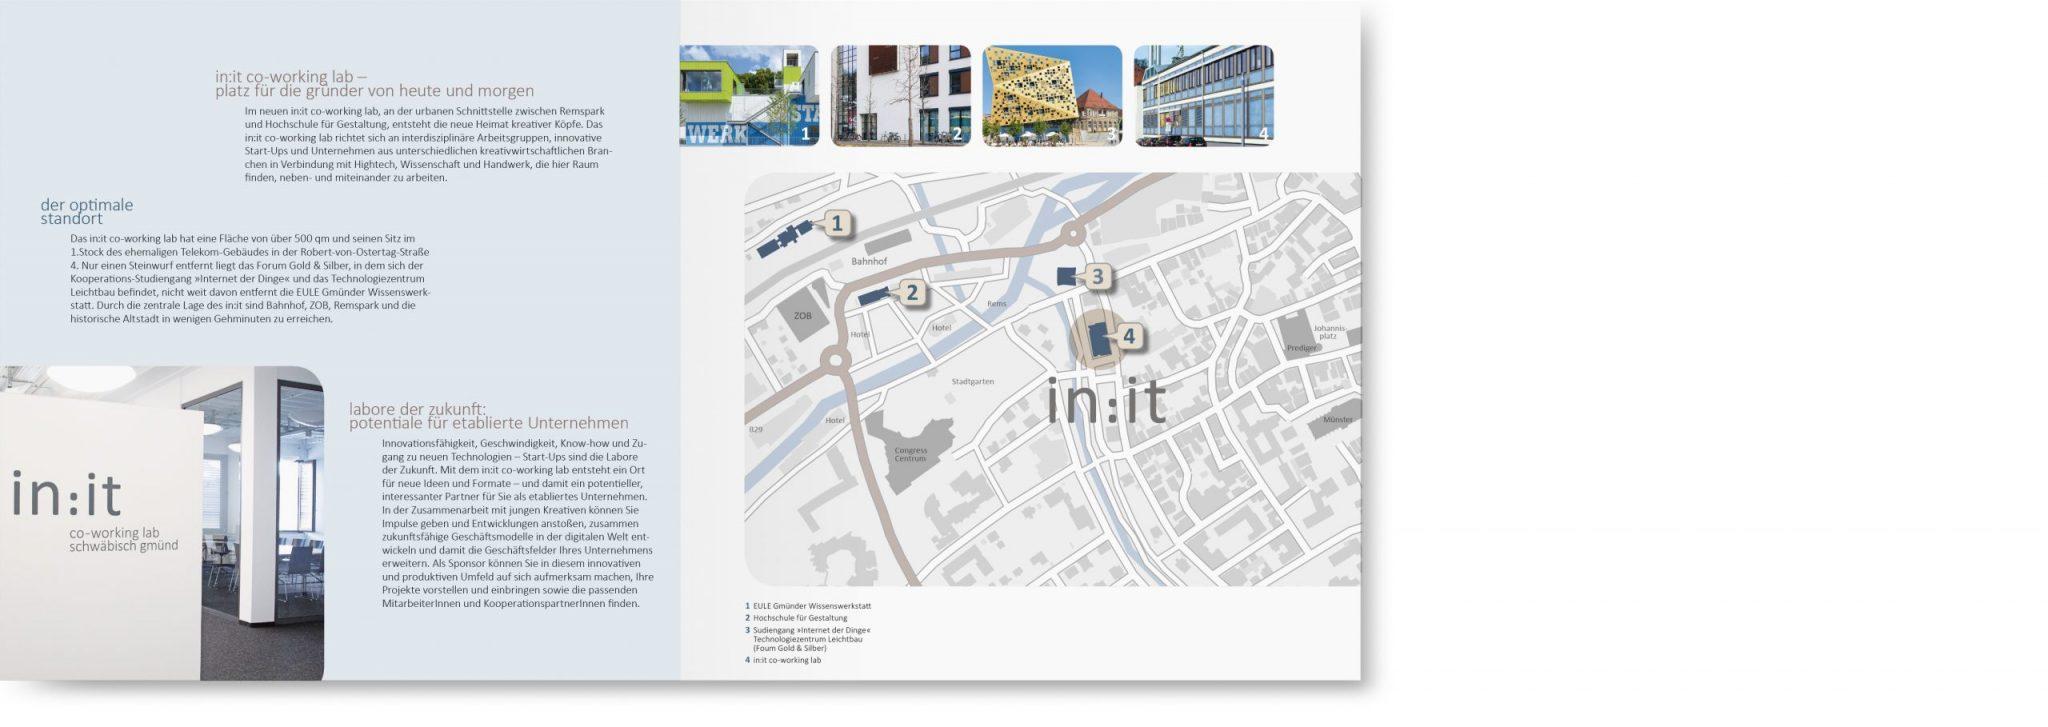 fh-web-init-sponsorenbroschuere-3-scaled.jpg